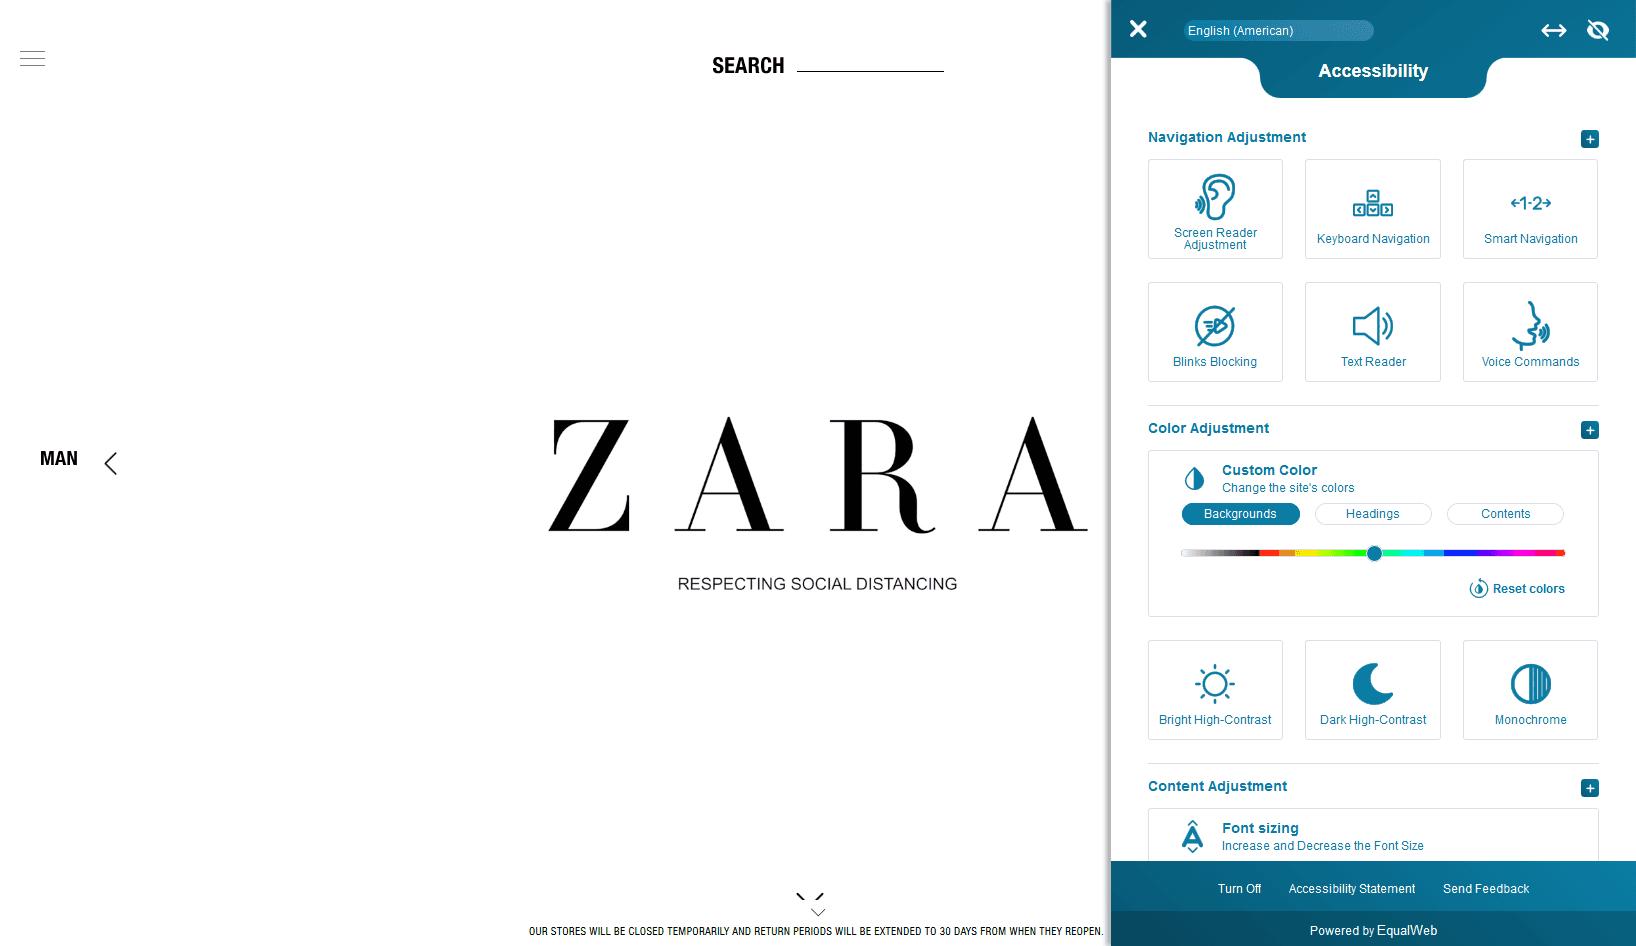 ZARA-Acessible-trending-design-for-2020.